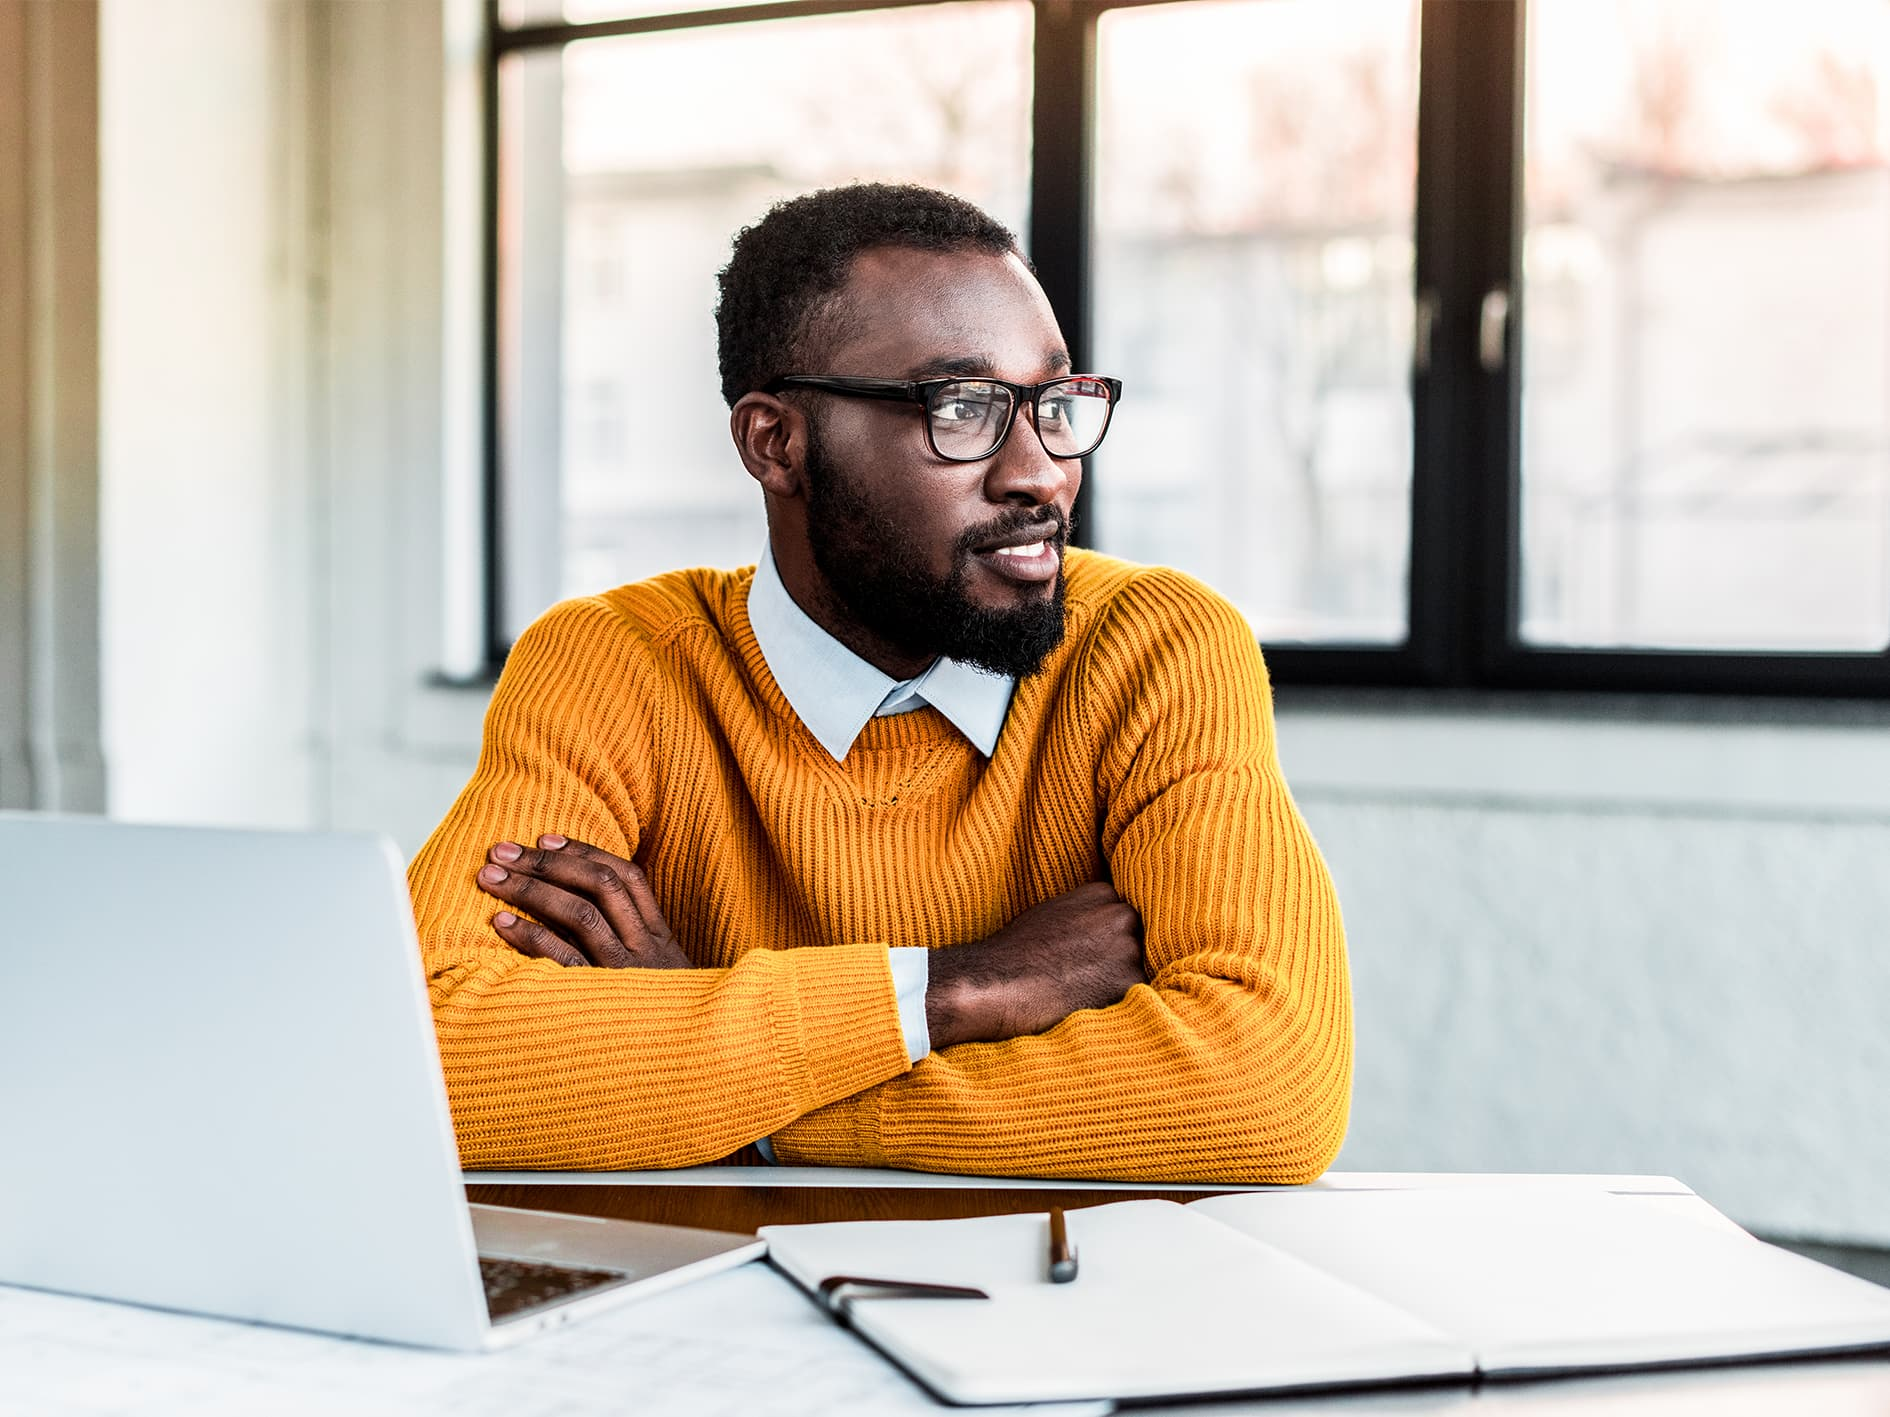 Legal professional learning Microsoft Word skills